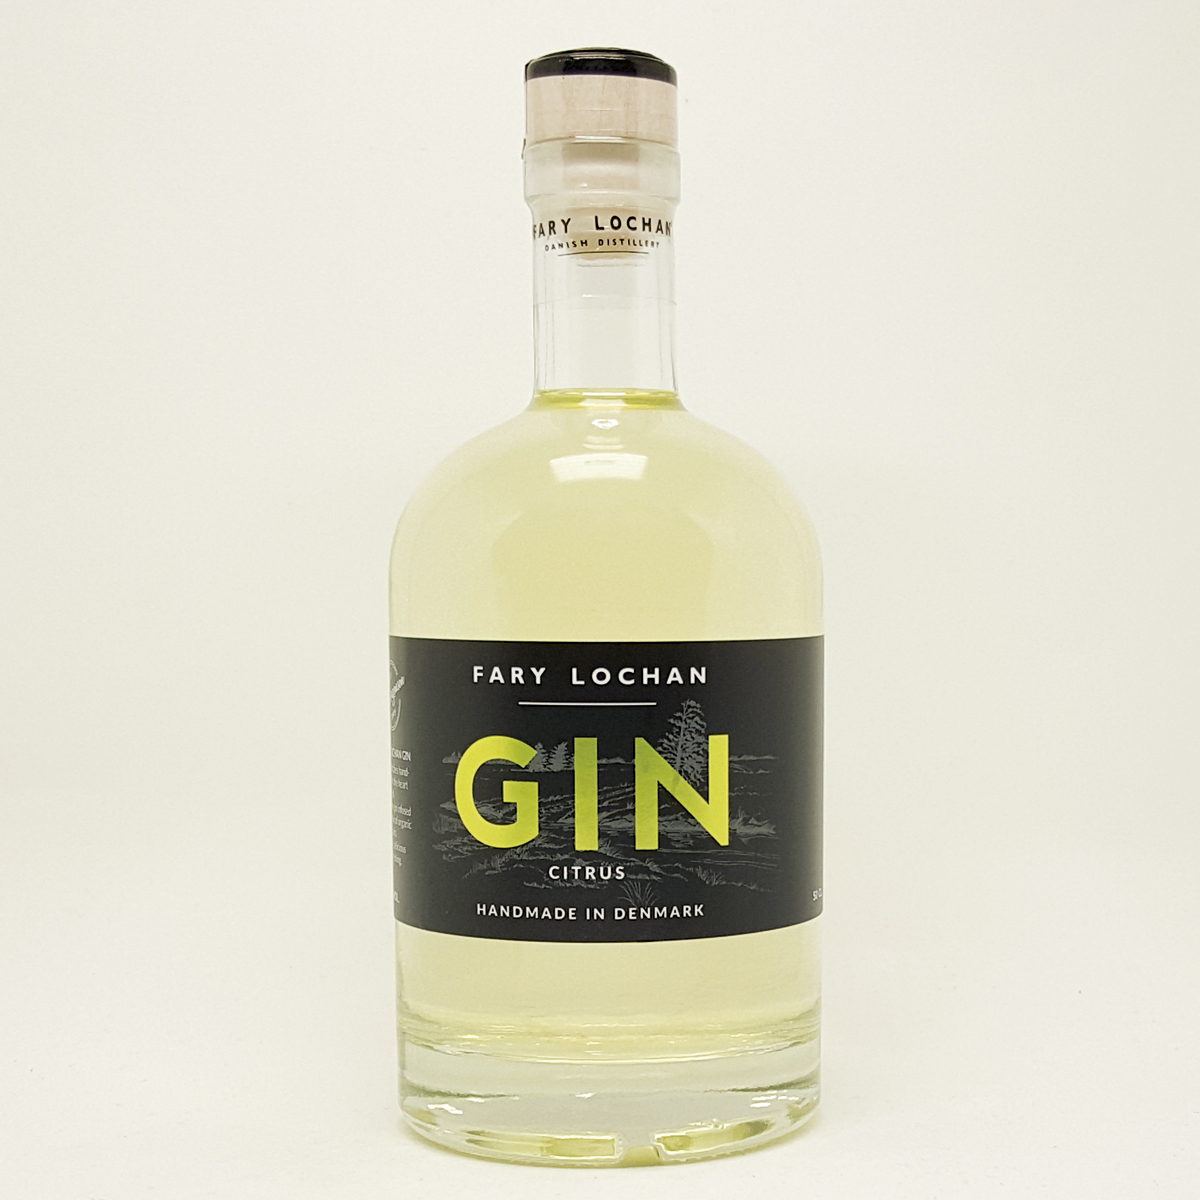 Gin_Citrus_Fary_Lochan